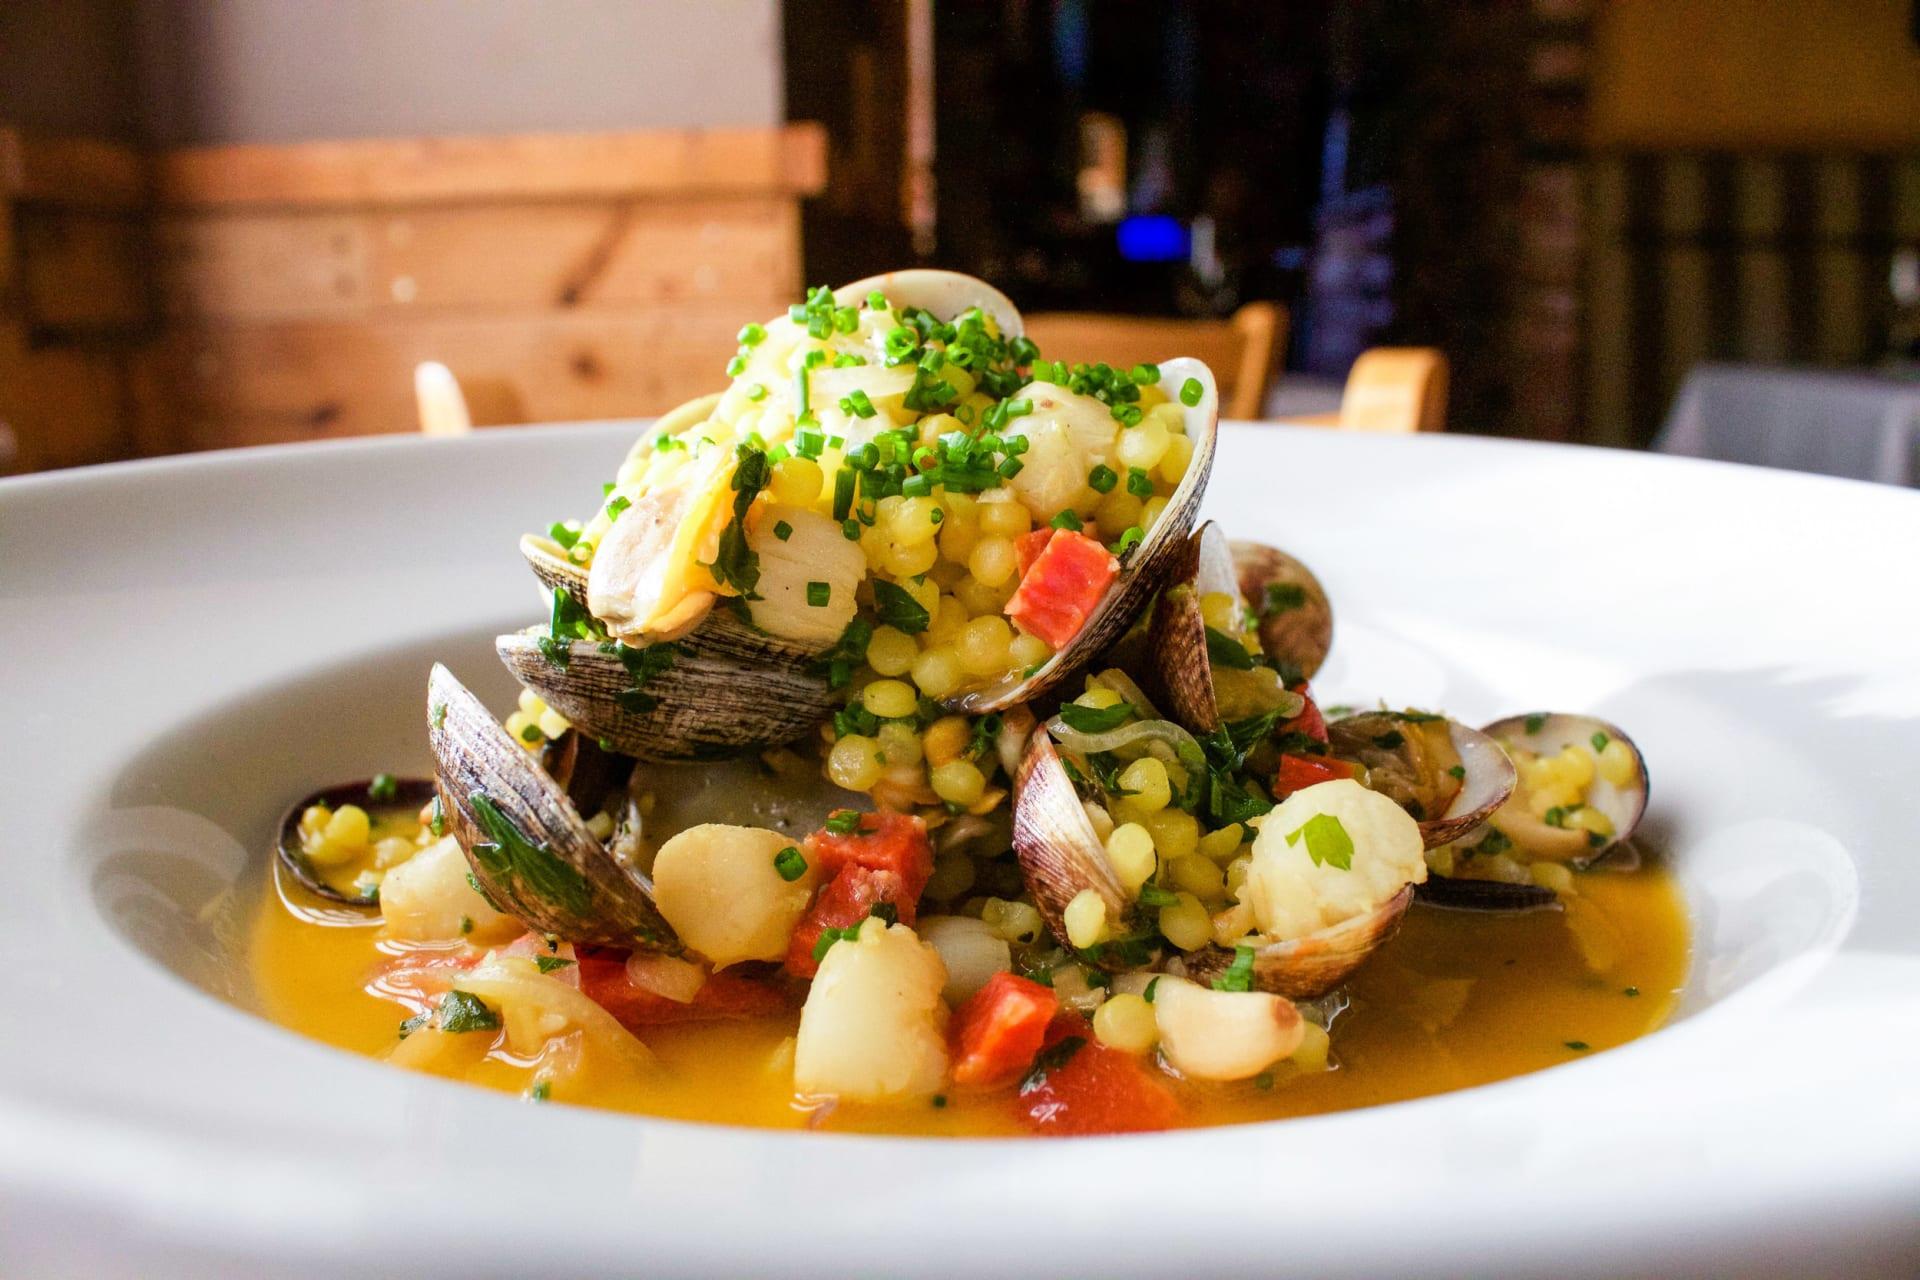 extreme close up of a seasonal seafood and corn dish